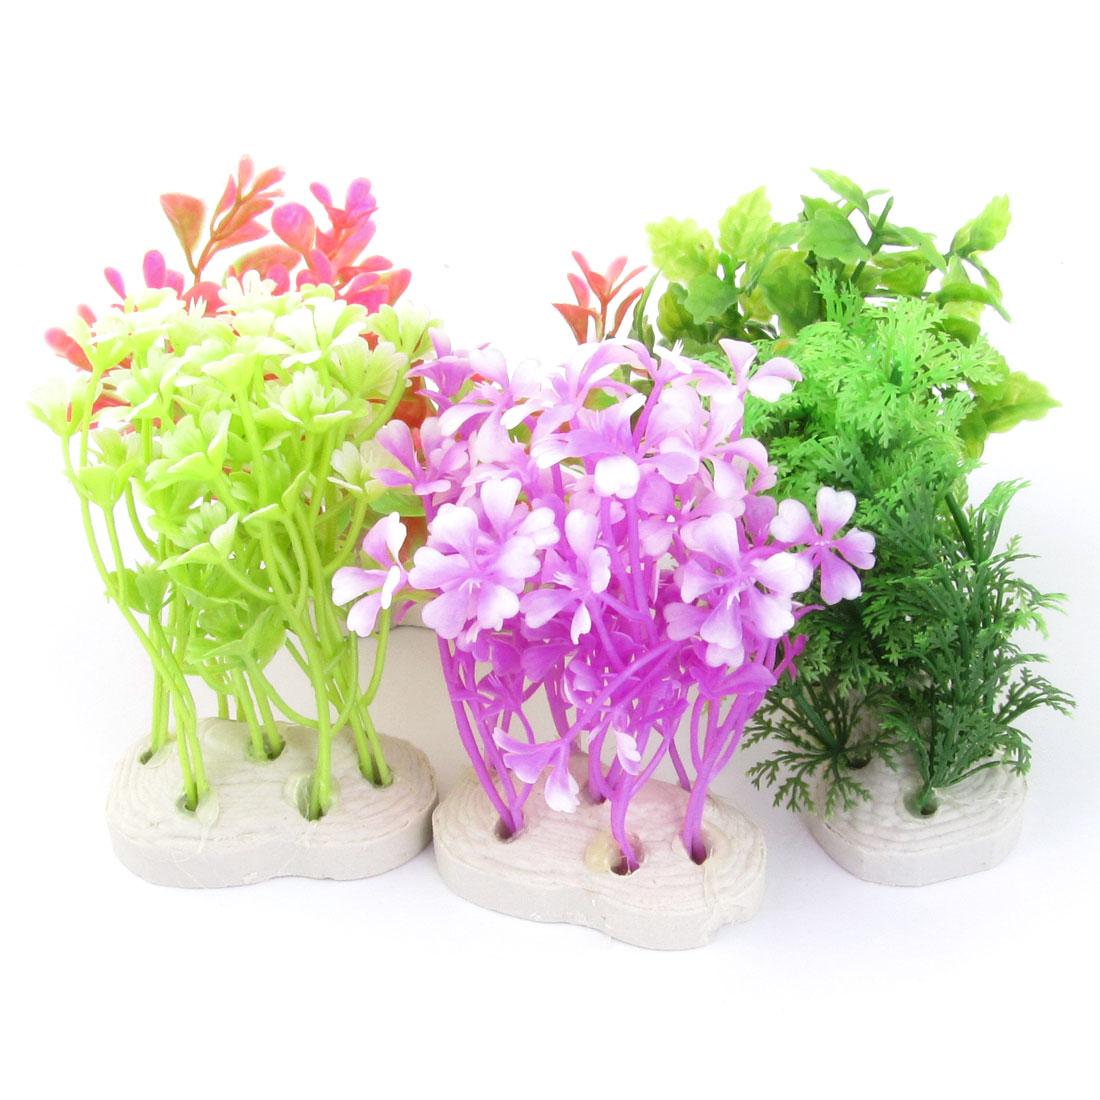 "Tri Color 3.9"" High Artificial Plastic Plant Grass 5 Pcs for Fish Tank"